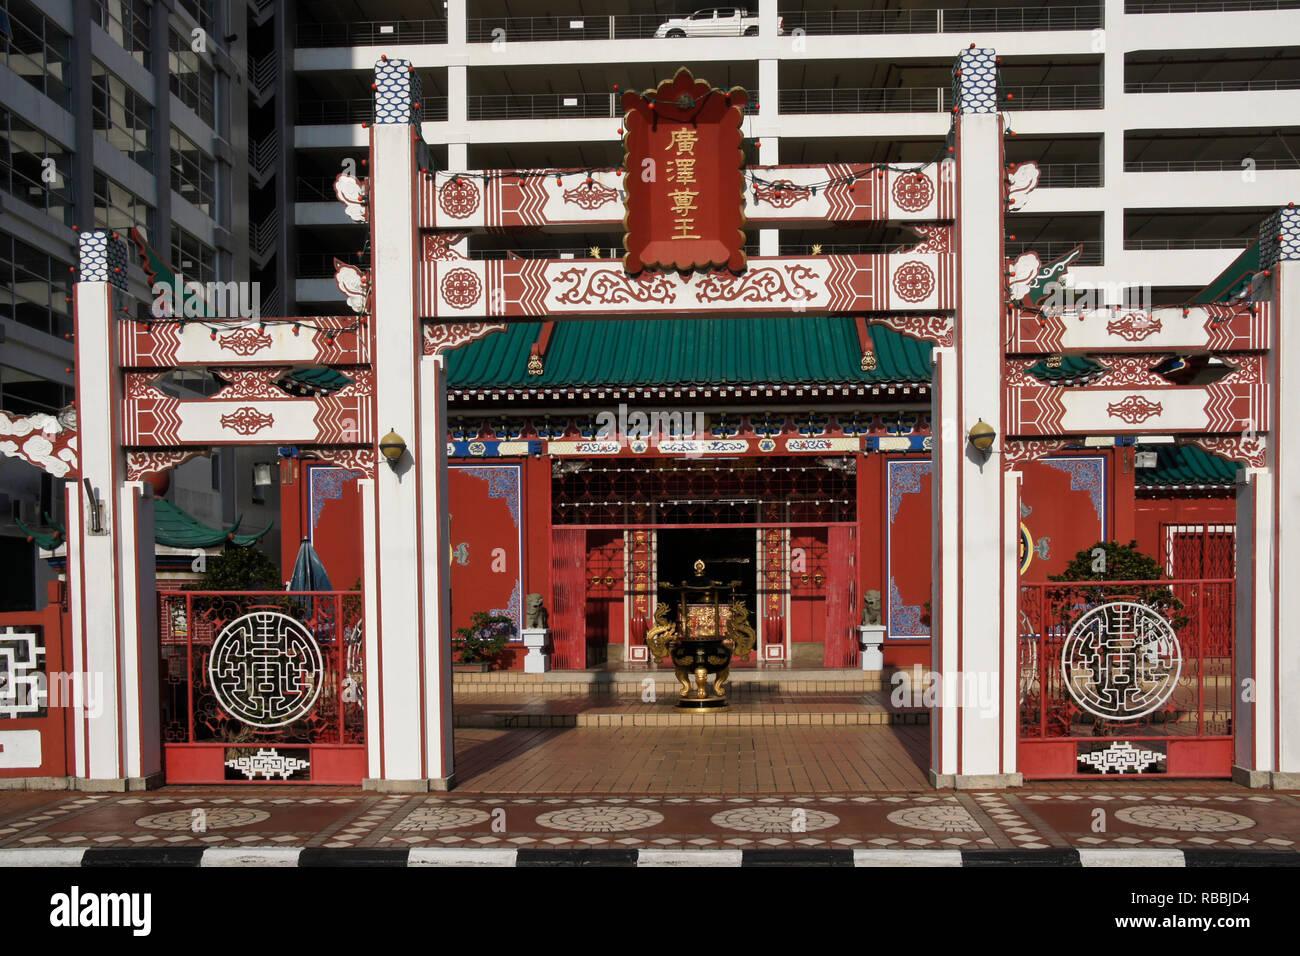 Chinese temple, Bandar Seri Begawan, Sultanate of Brunei - Stock Image